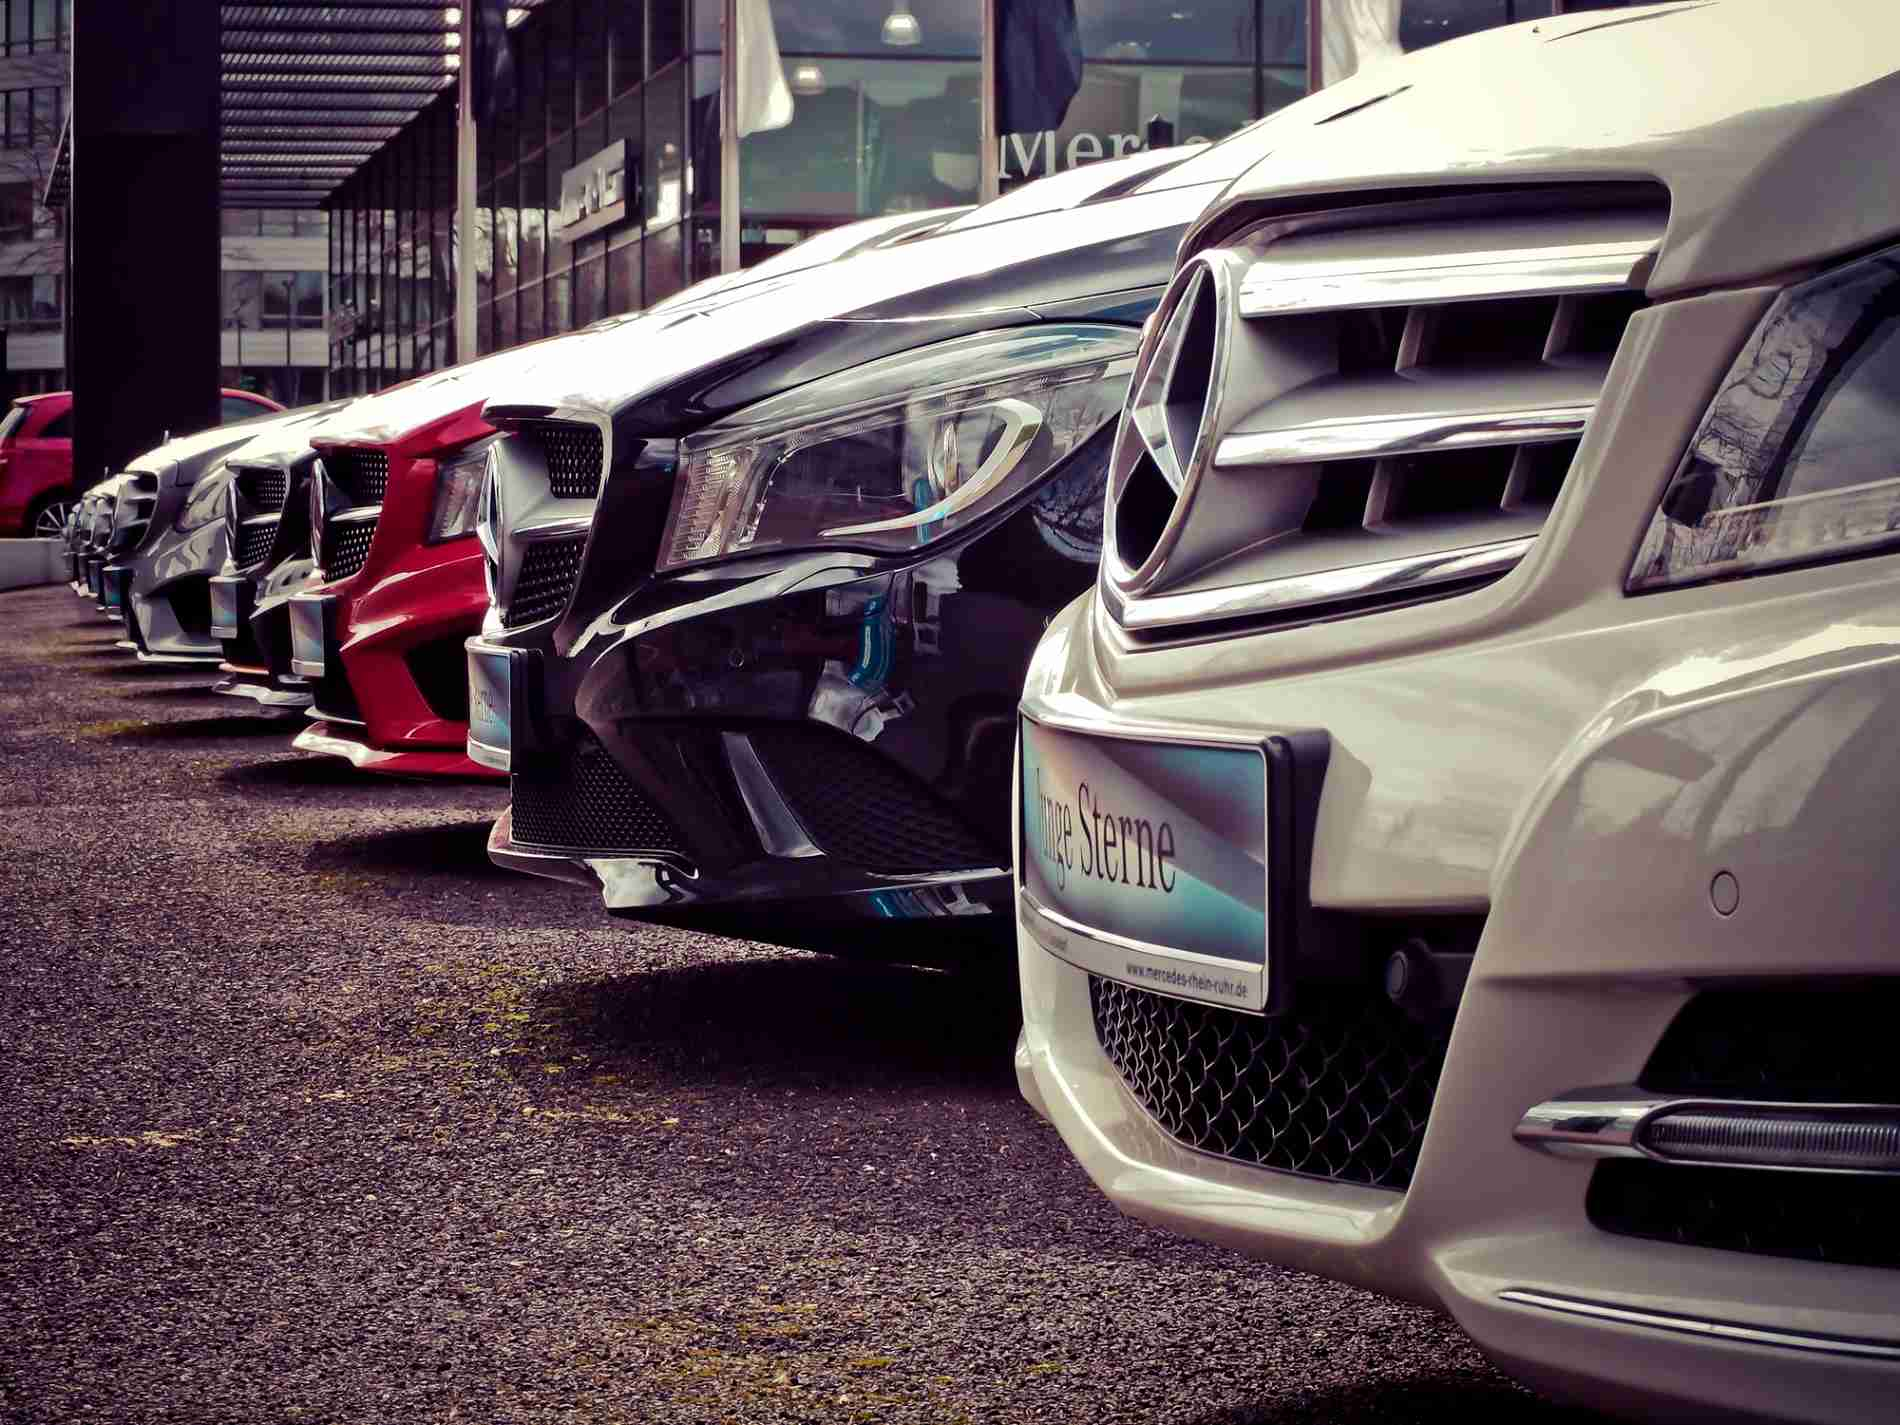 MercedesParked.jpg wash.gt professionals Wash.GT Professionals MercedesParked